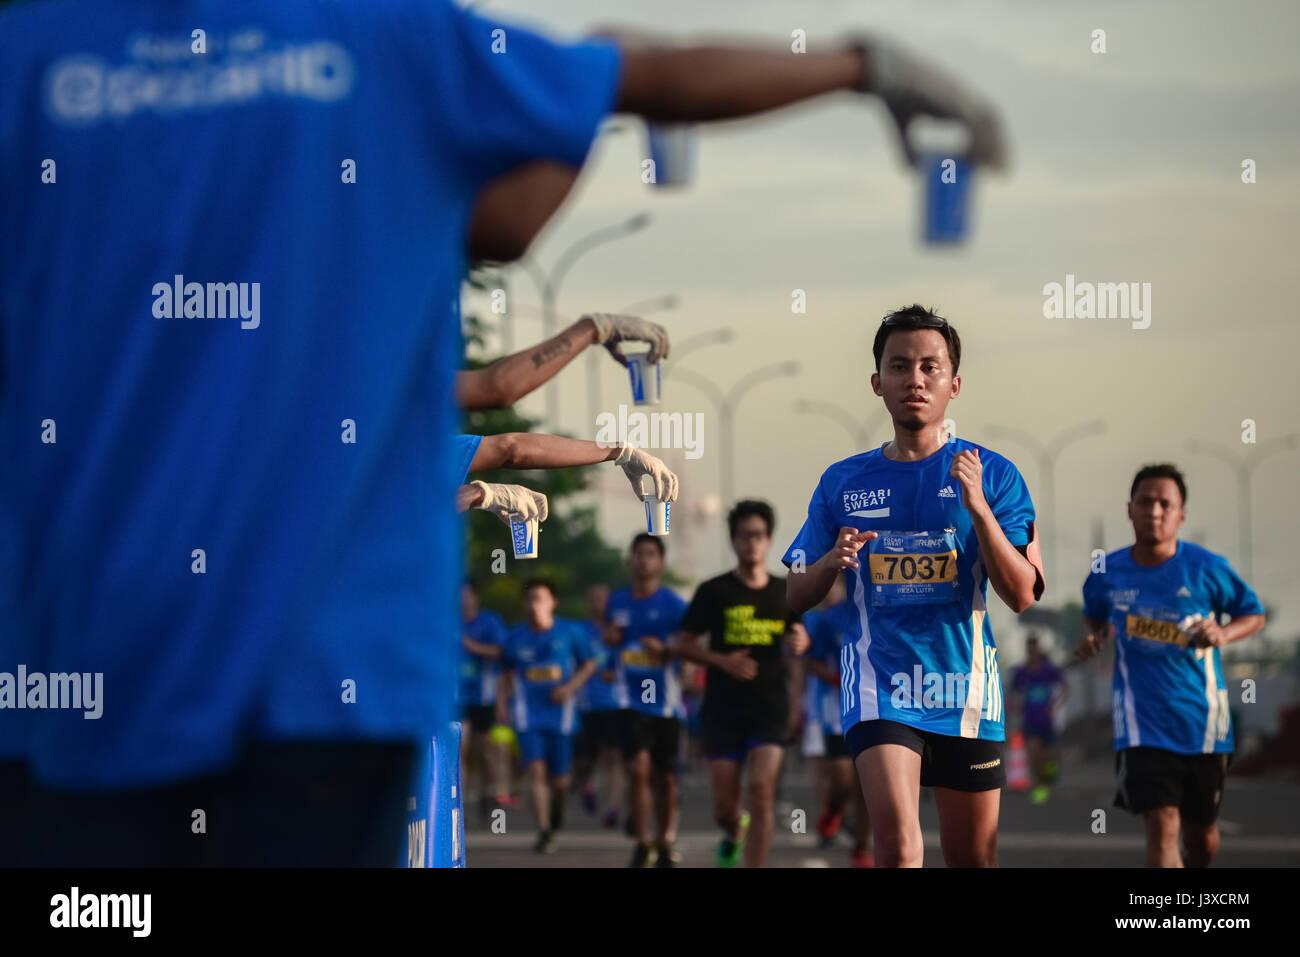 Runners pass a water station during the 2015 Pocari Run in South Tangerang, Banten, Indonesia. © Reynold Sumayku - Stock Image